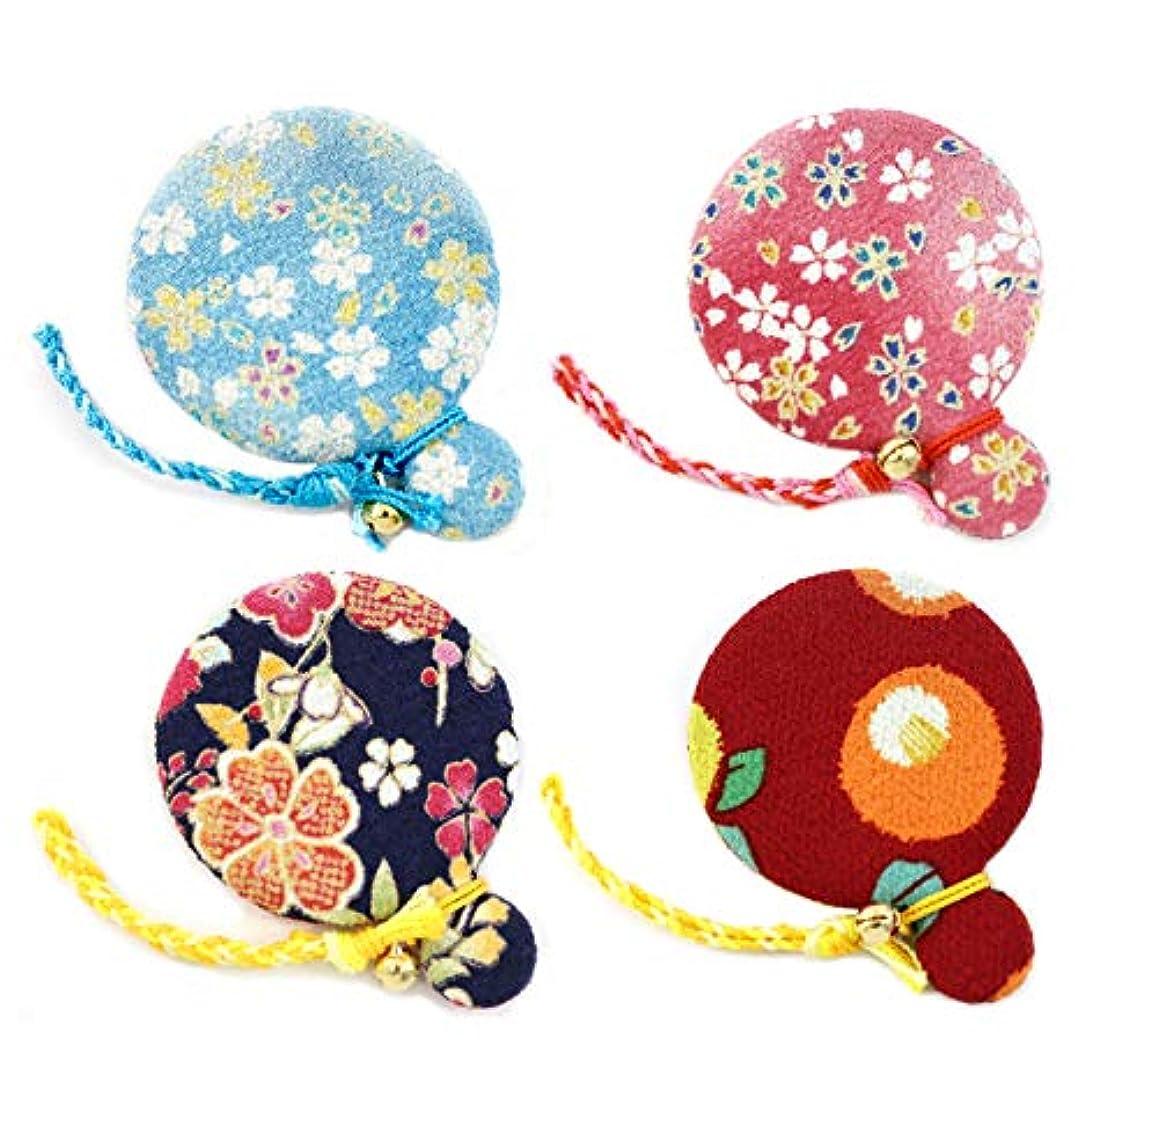 ZOON(ズーン) 花ちりめん コンパクトミラー お得なセット4(4個入) 和柄 着物 ちりめん 生地 布製 まる鏡 日本製 お土産 セット4(空色、薄紅、紺、赤椿)